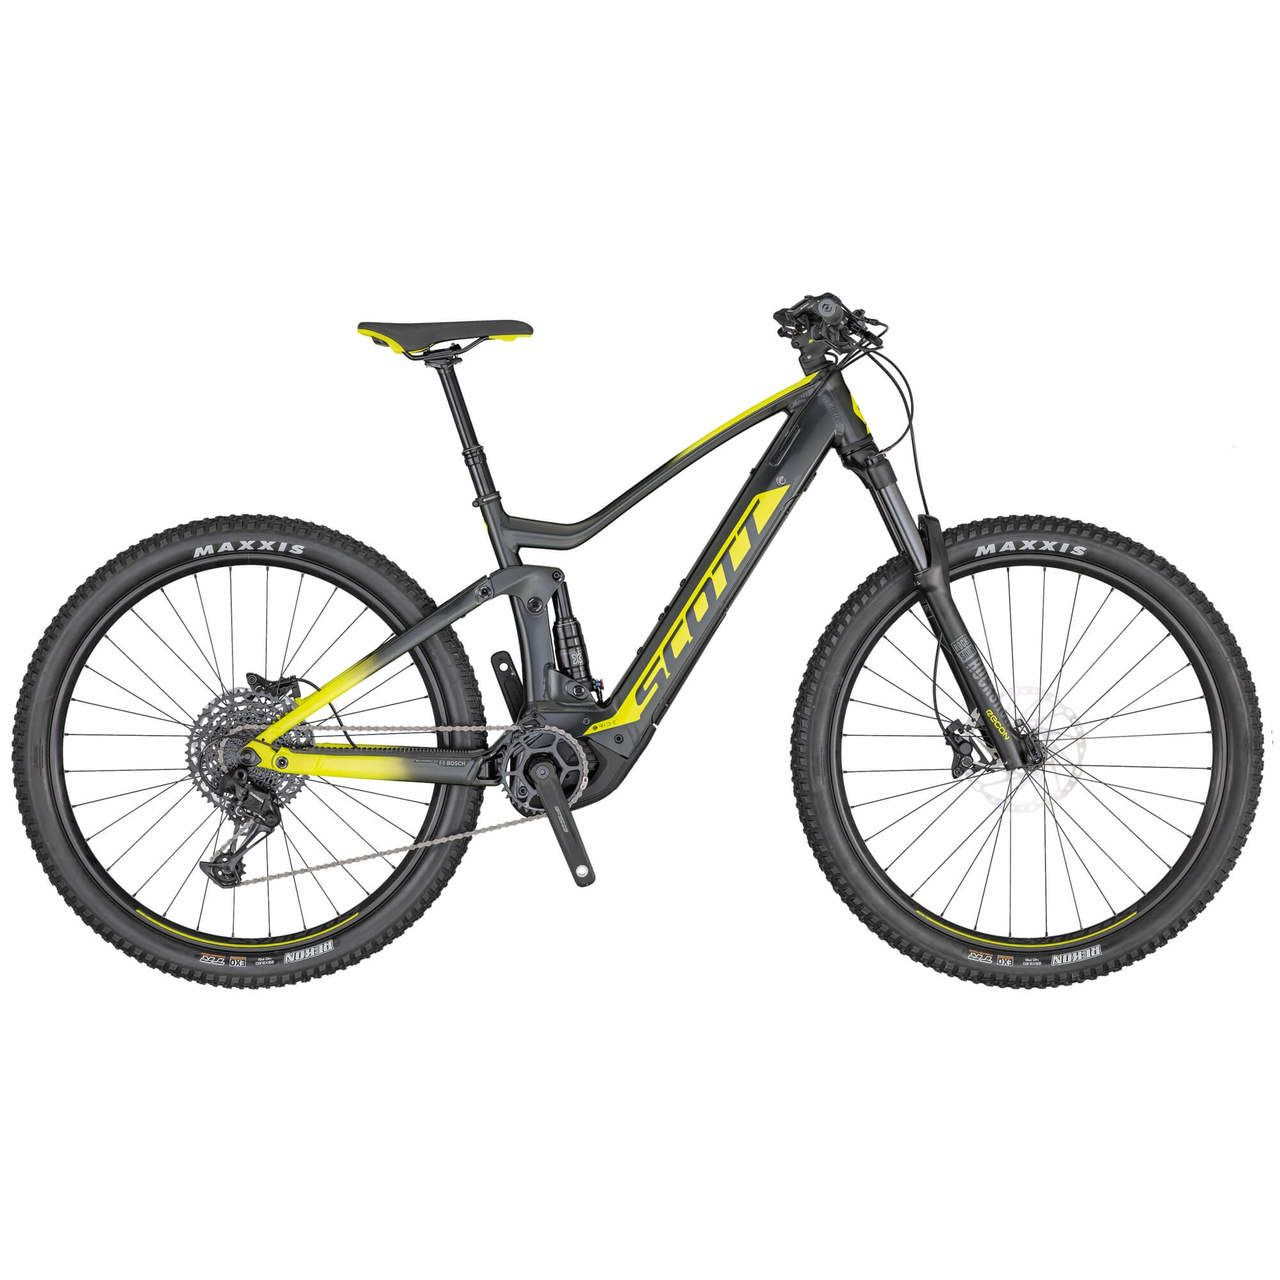 Scott Electric Strike Eride 940 Green 2020 Mountain Biking